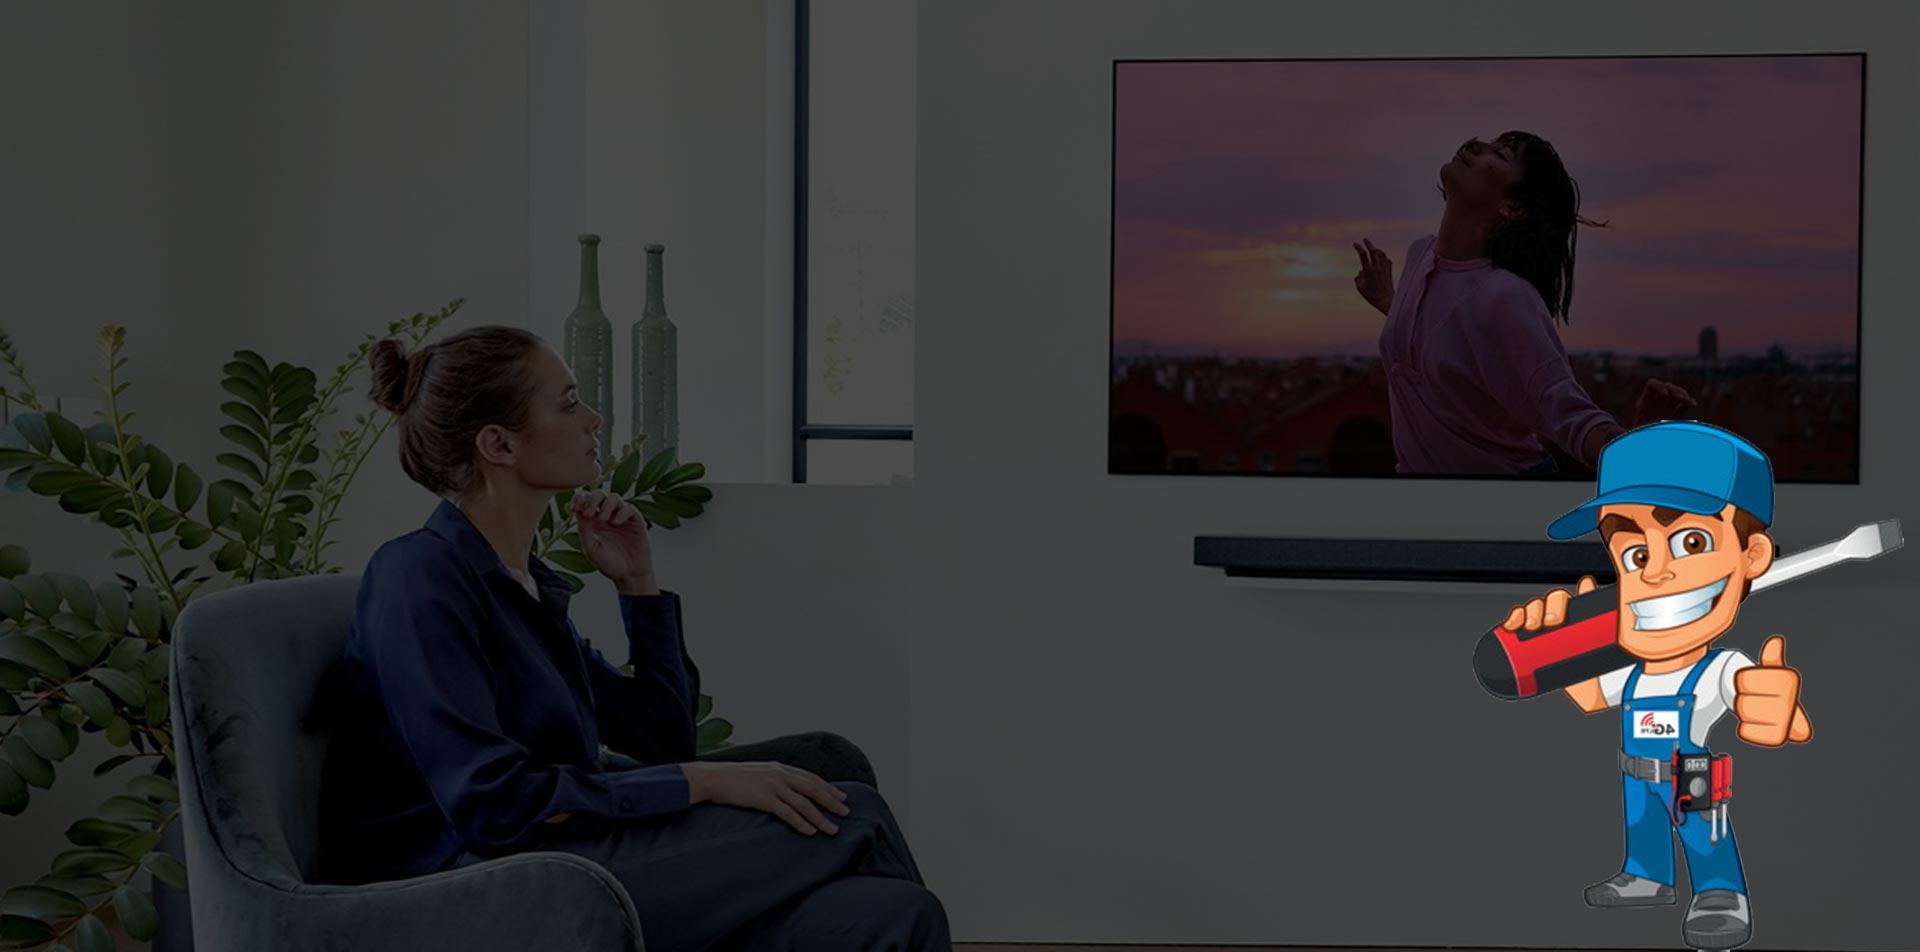 تعمیر تلویزیون پاناسونیک در منزل